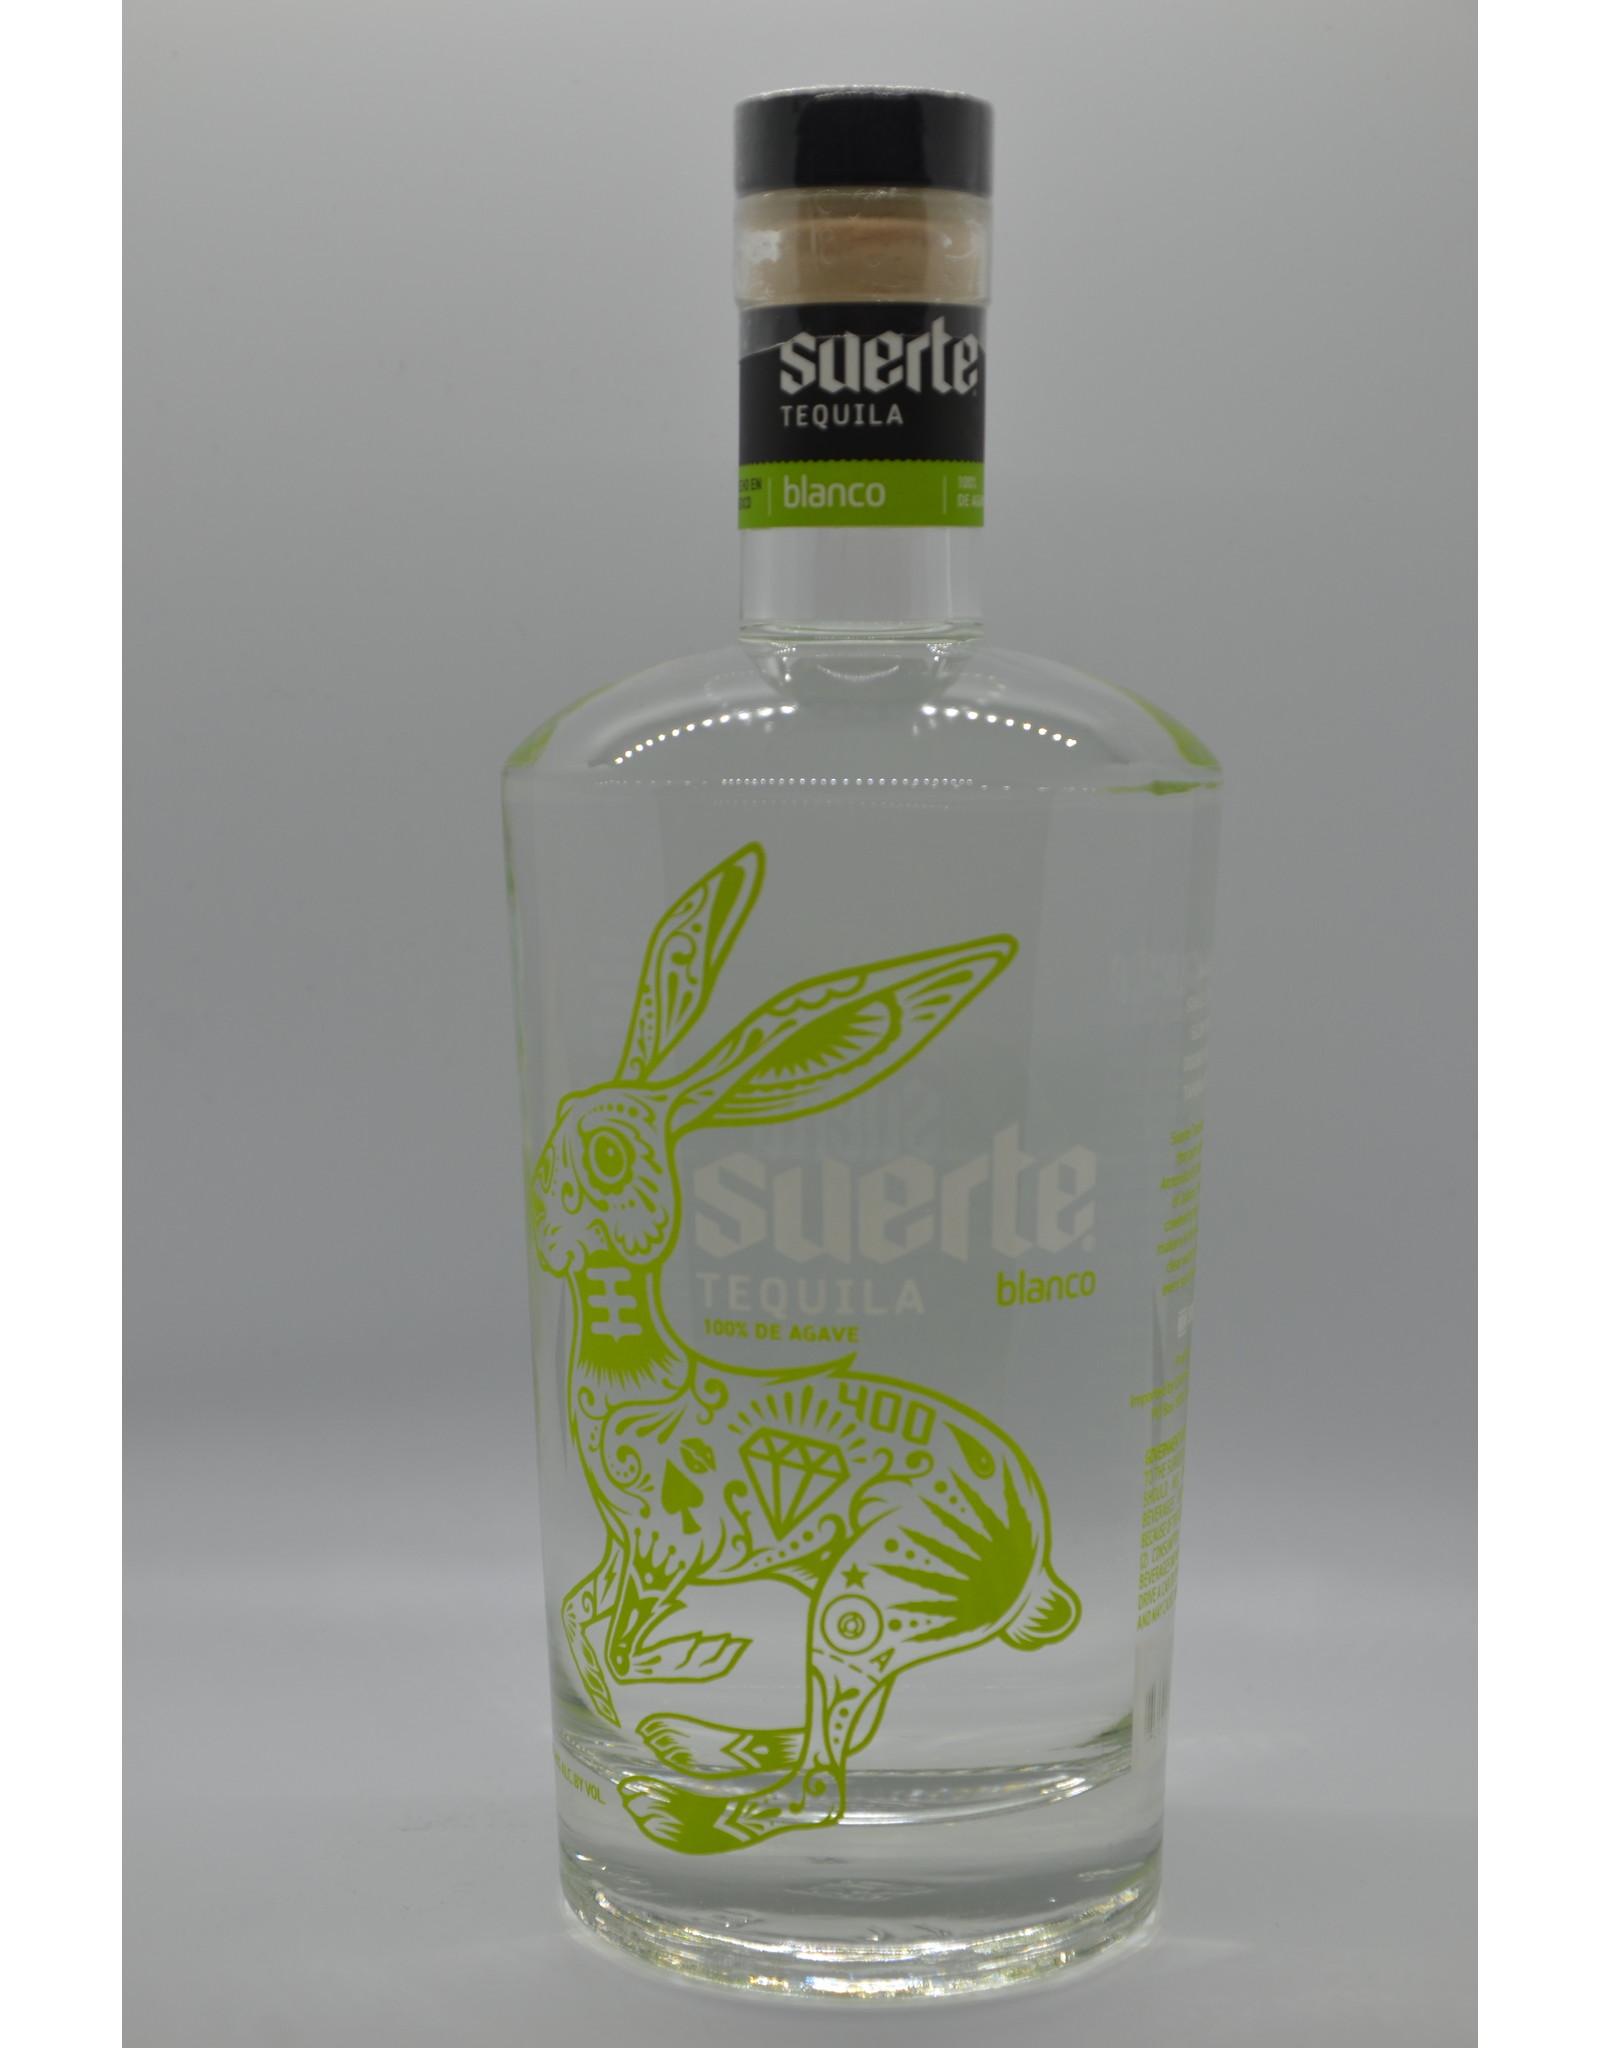 Mexico Suerte Tequila Blanco